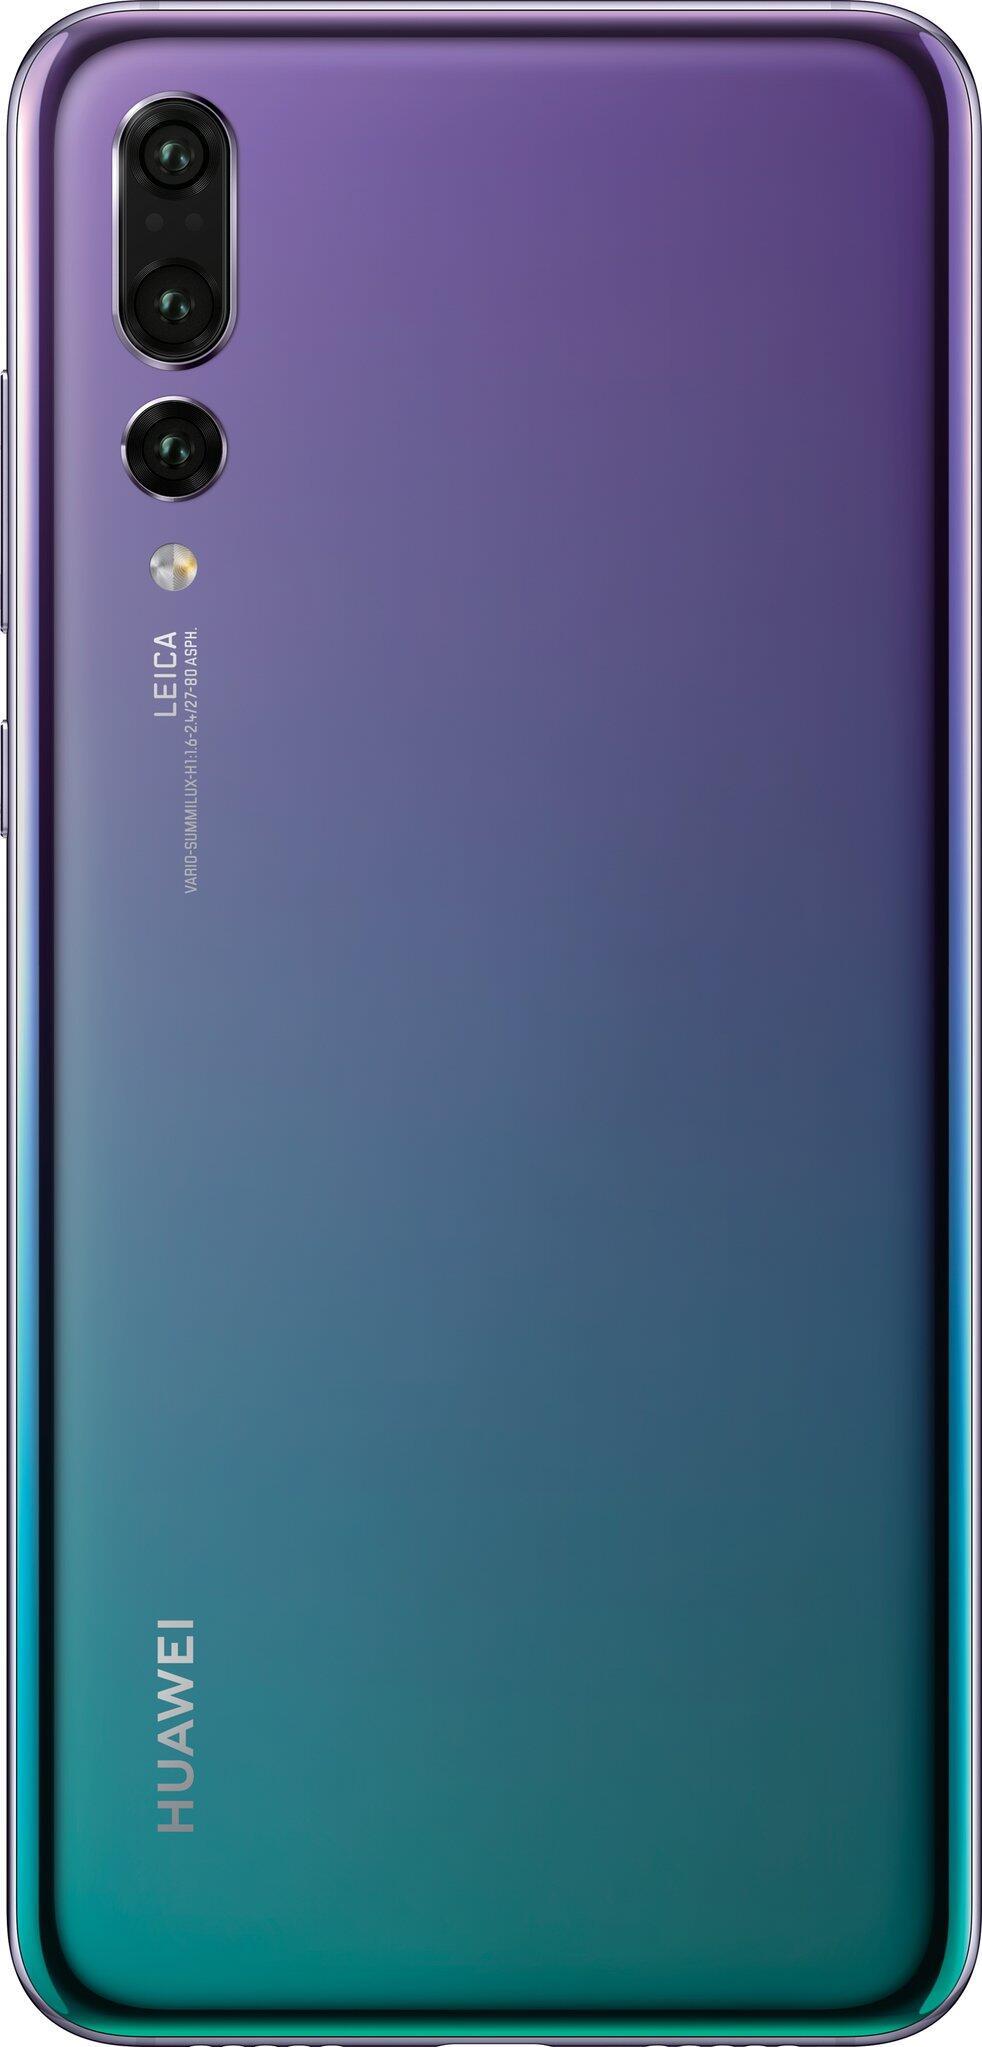 Huawei P20 Pro Twilight Leak